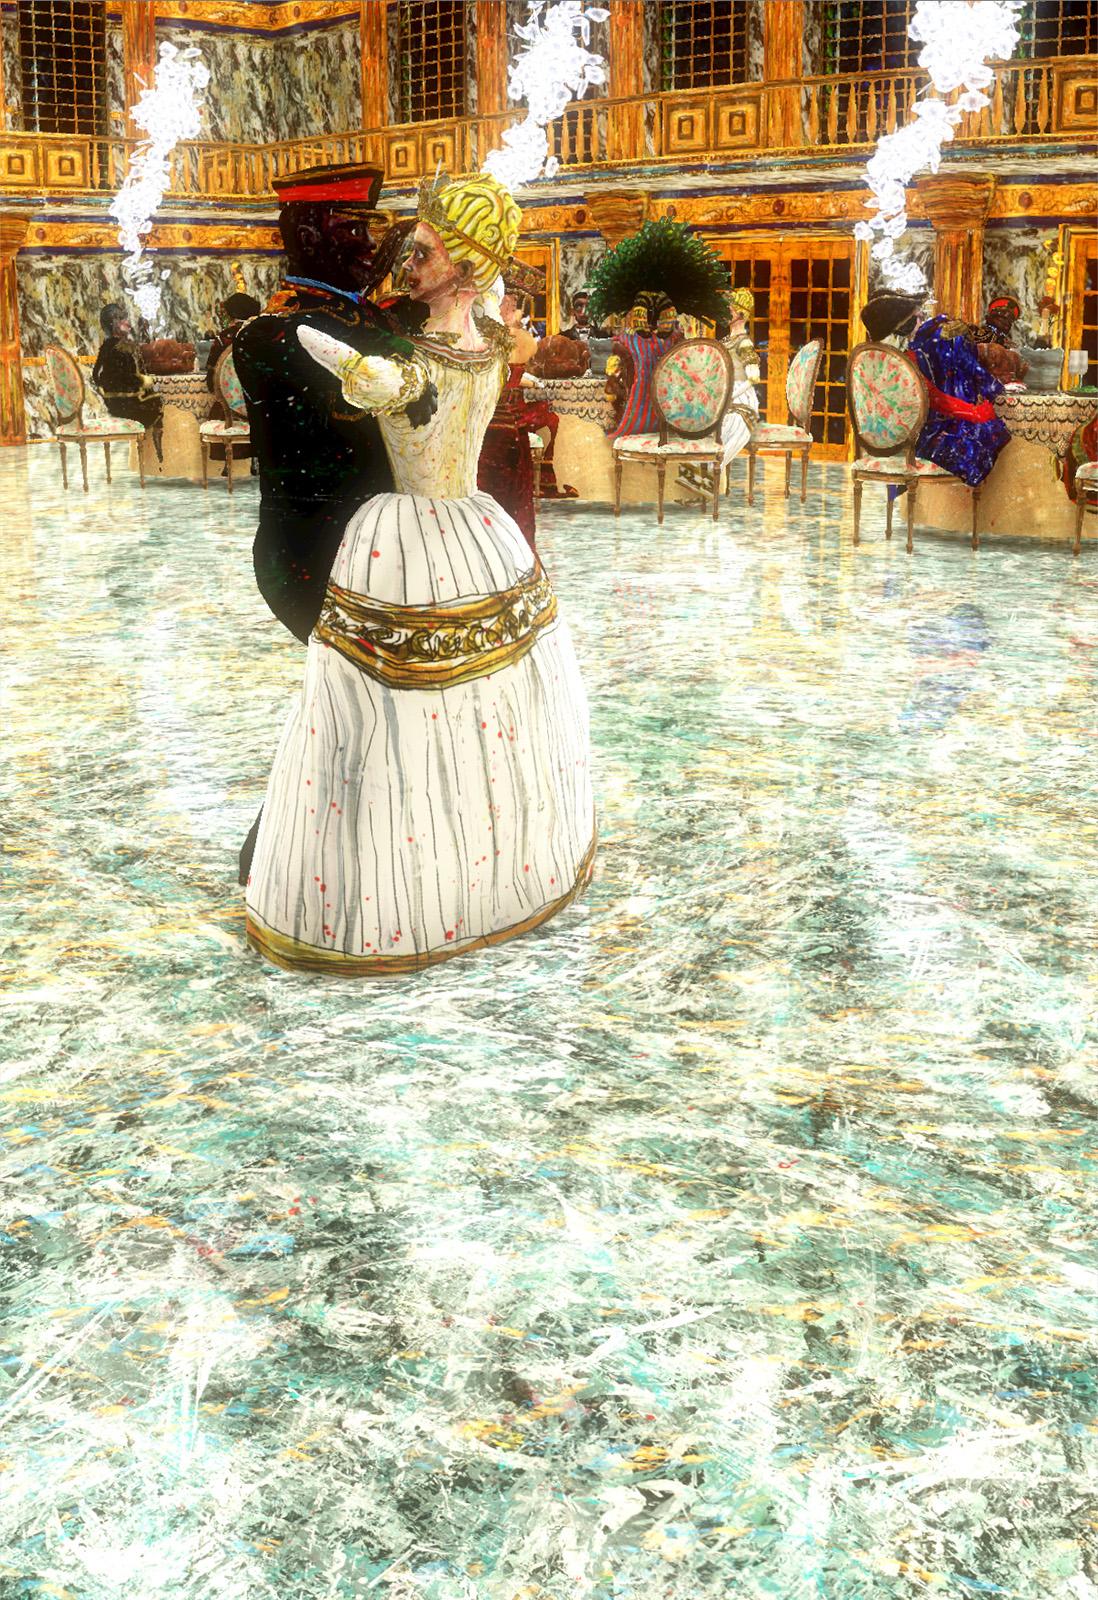 TheBallroom_dance_2_web.jpg